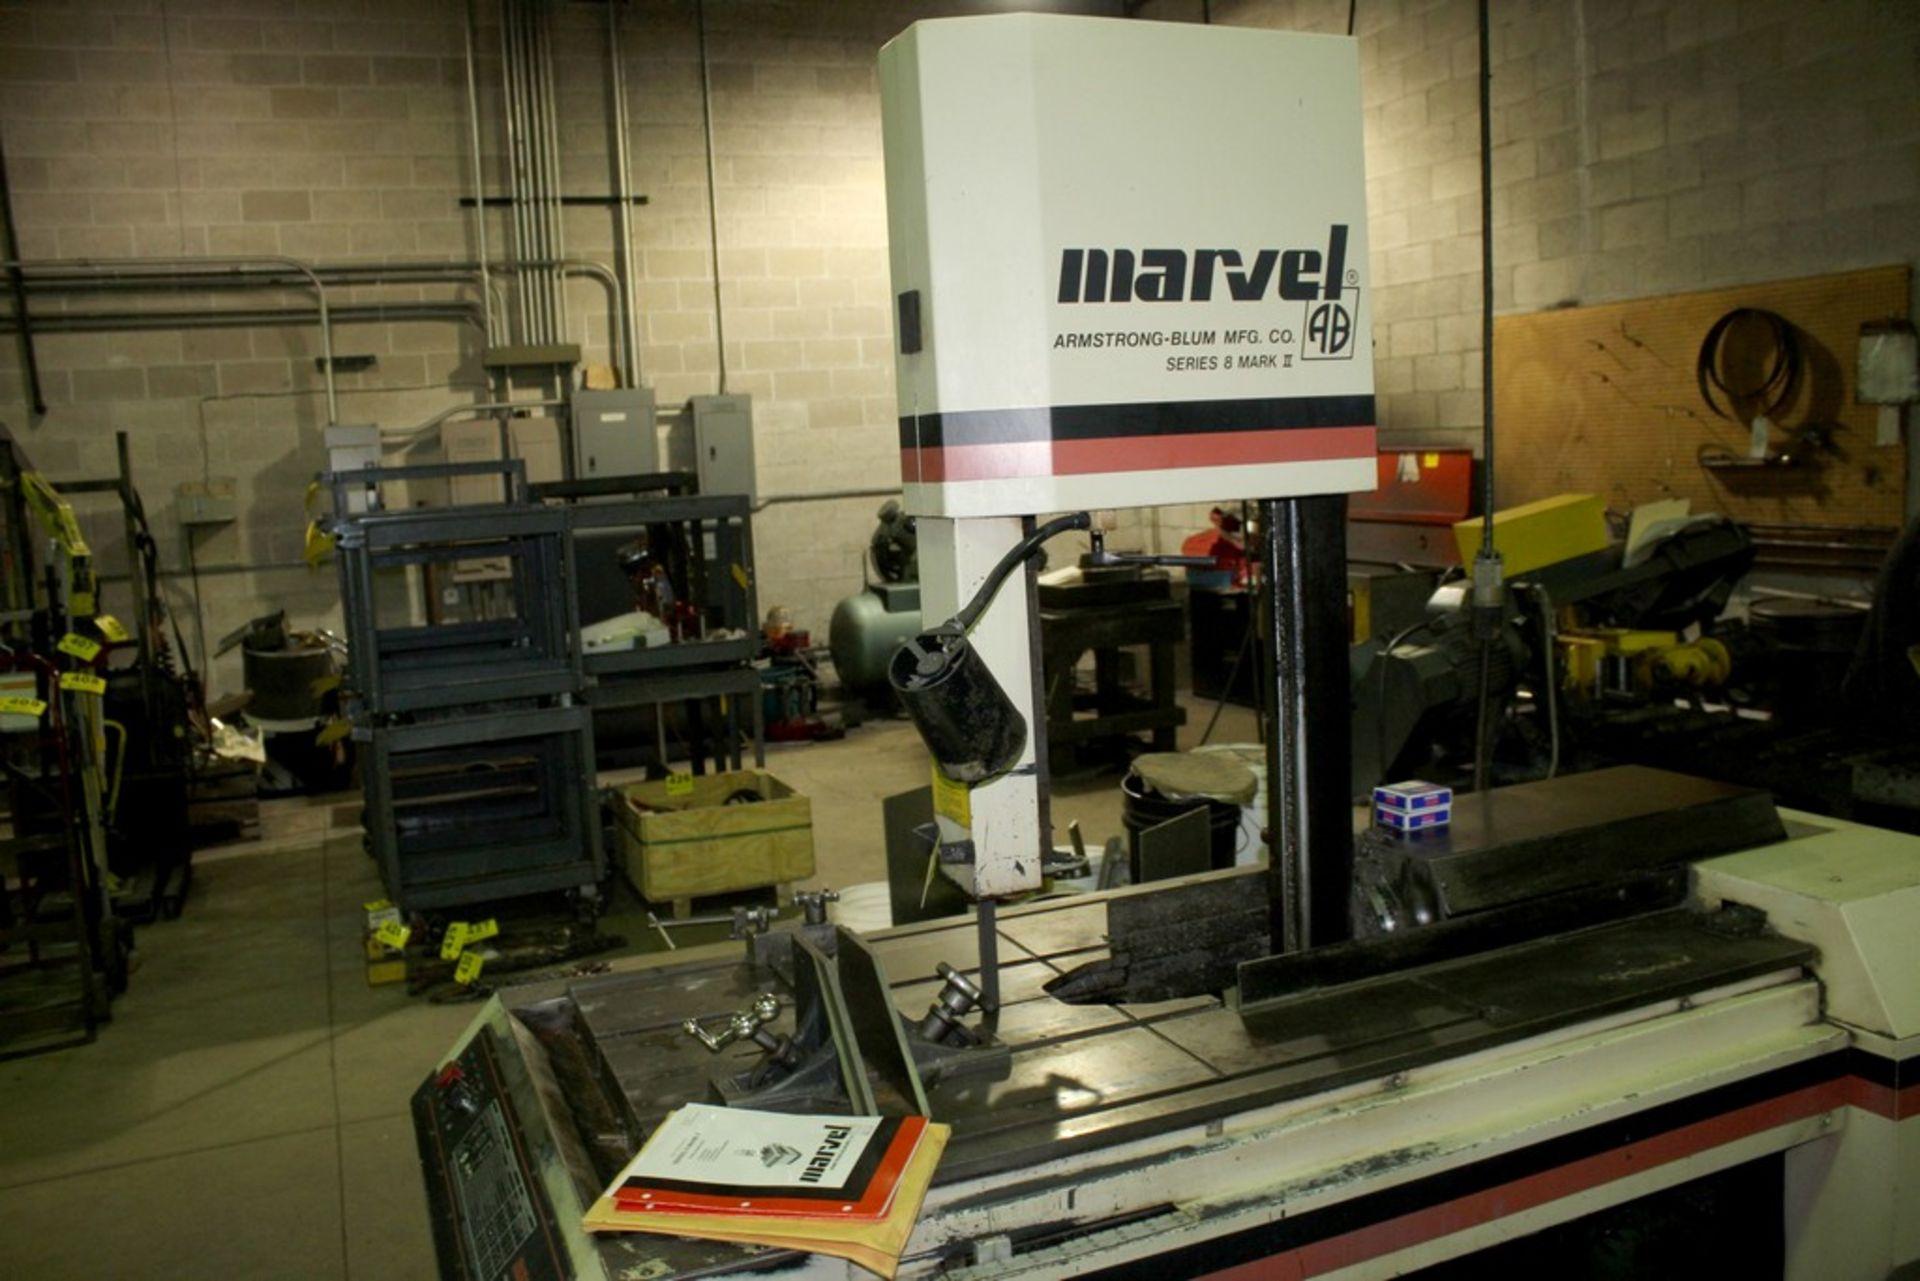 Lot 55 - MARVEL SERIES 8 MODEL MARK II UNIVERSAL VERTICAL BAND SAW, S/N 826871